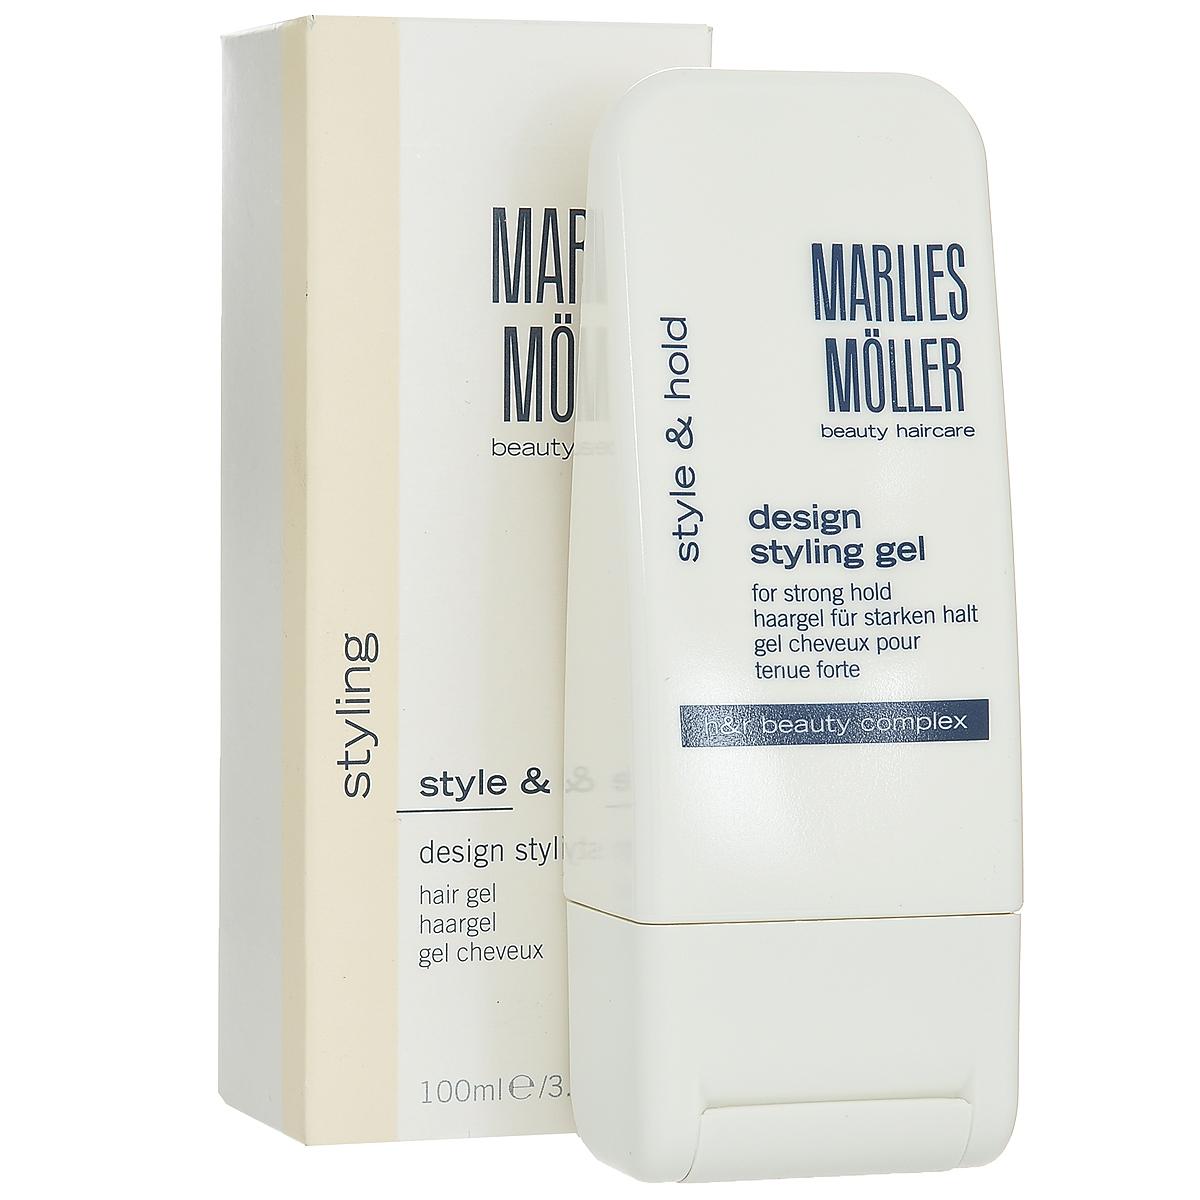 Marlies Moller Гель Styling, для креативной укладки волос, 100 мл